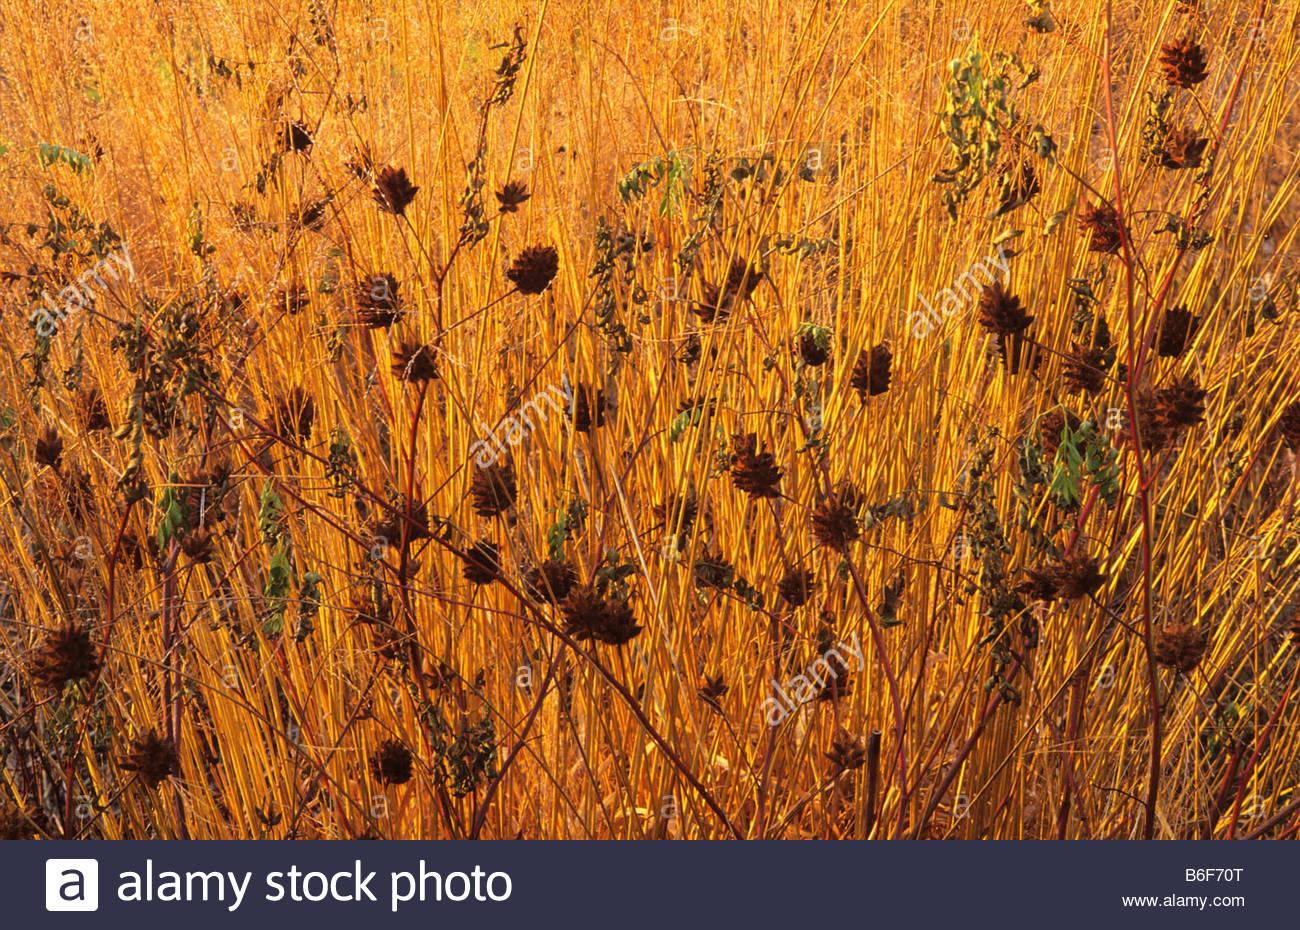 RHS Wisley Surrey design Piet Oudolf Glycyrrhiza yunnanensis seedheads Molinia Karl Forster - Stock Image